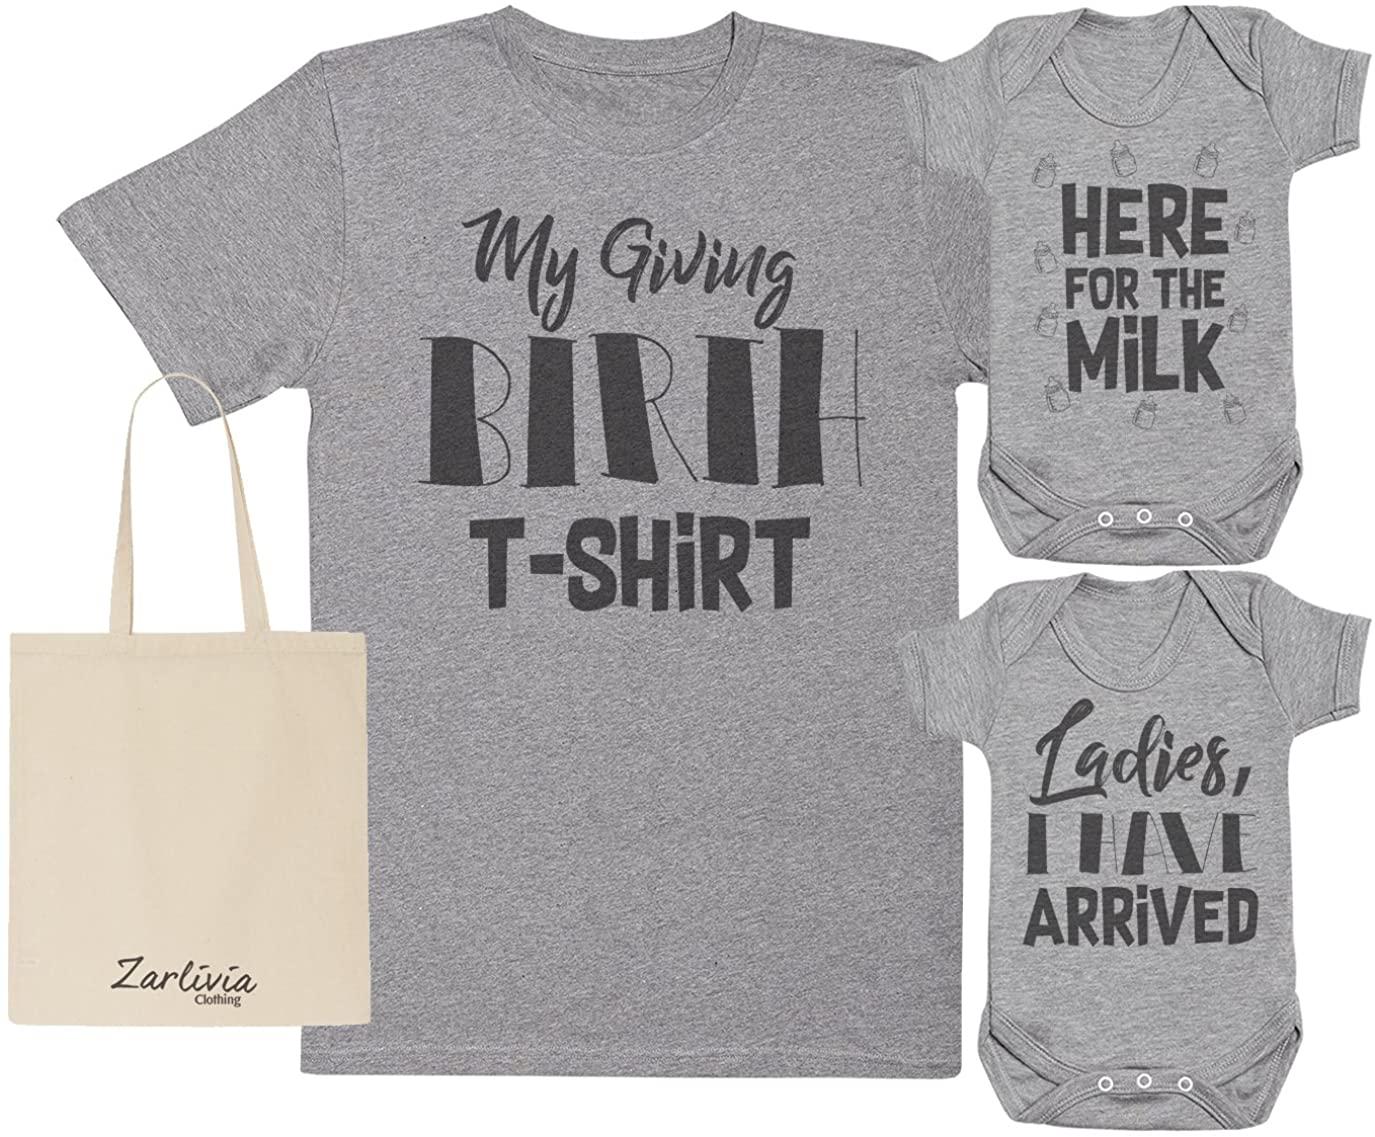 Zarlivia Clothing Arrived - Maternity Hospital Gift Set Bag with Hospital T-Shirt & 2X New Baby Bodysuit